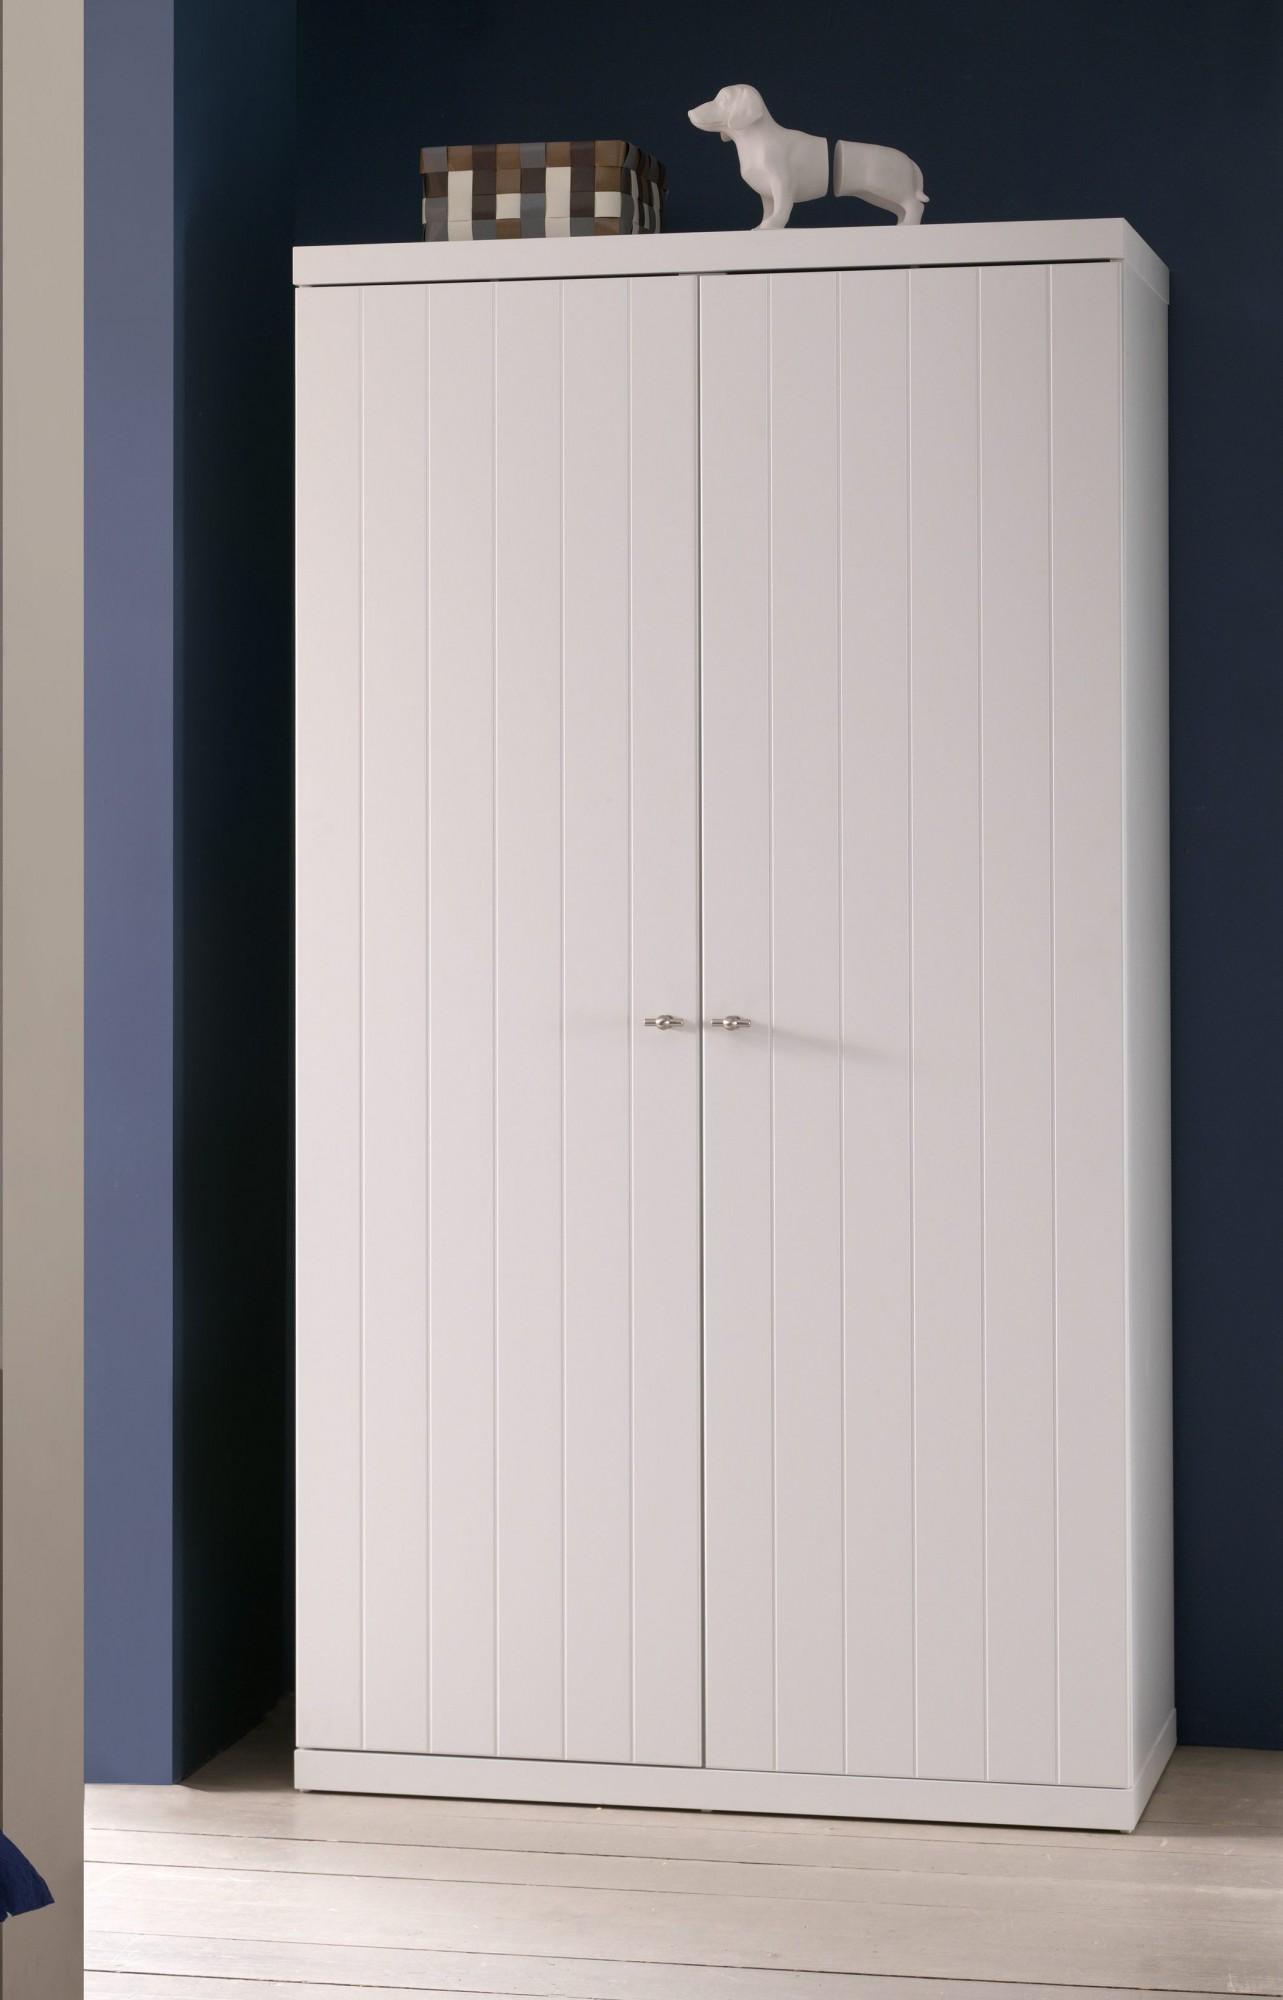 kleiderschrank 2 t rig fotos das sieht wunderbar mobelpix. Black Bedroom Furniture Sets. Home Design Ideas